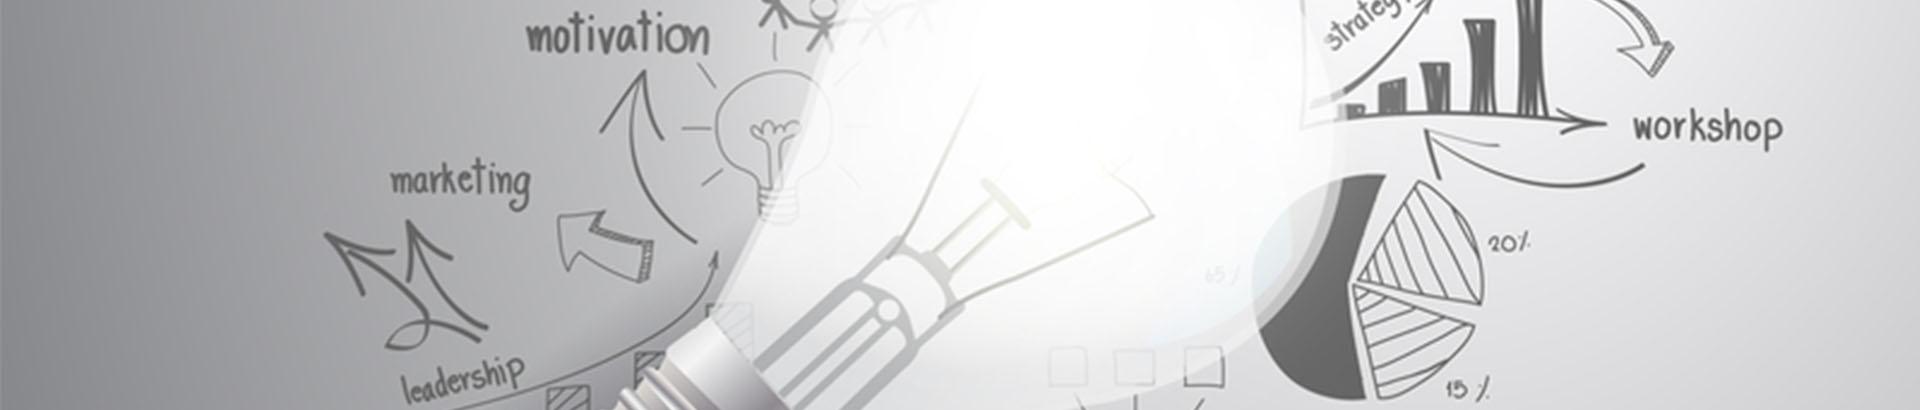 Zero-touch Economy and Zero-distance Innovation